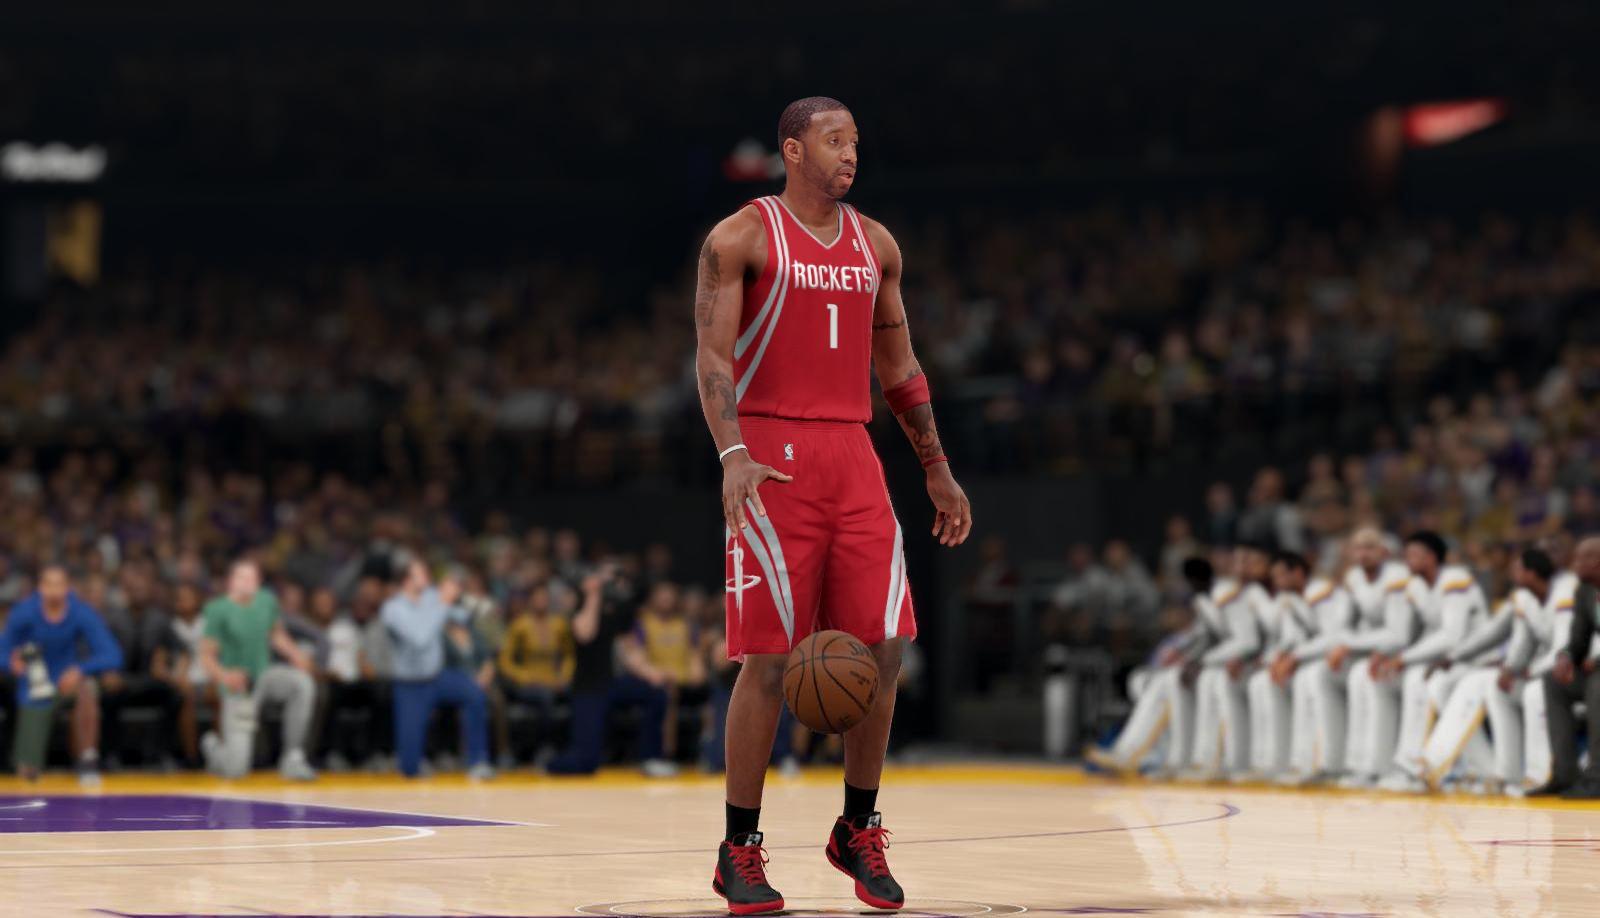 NBA2k20安卓版第9张预览图